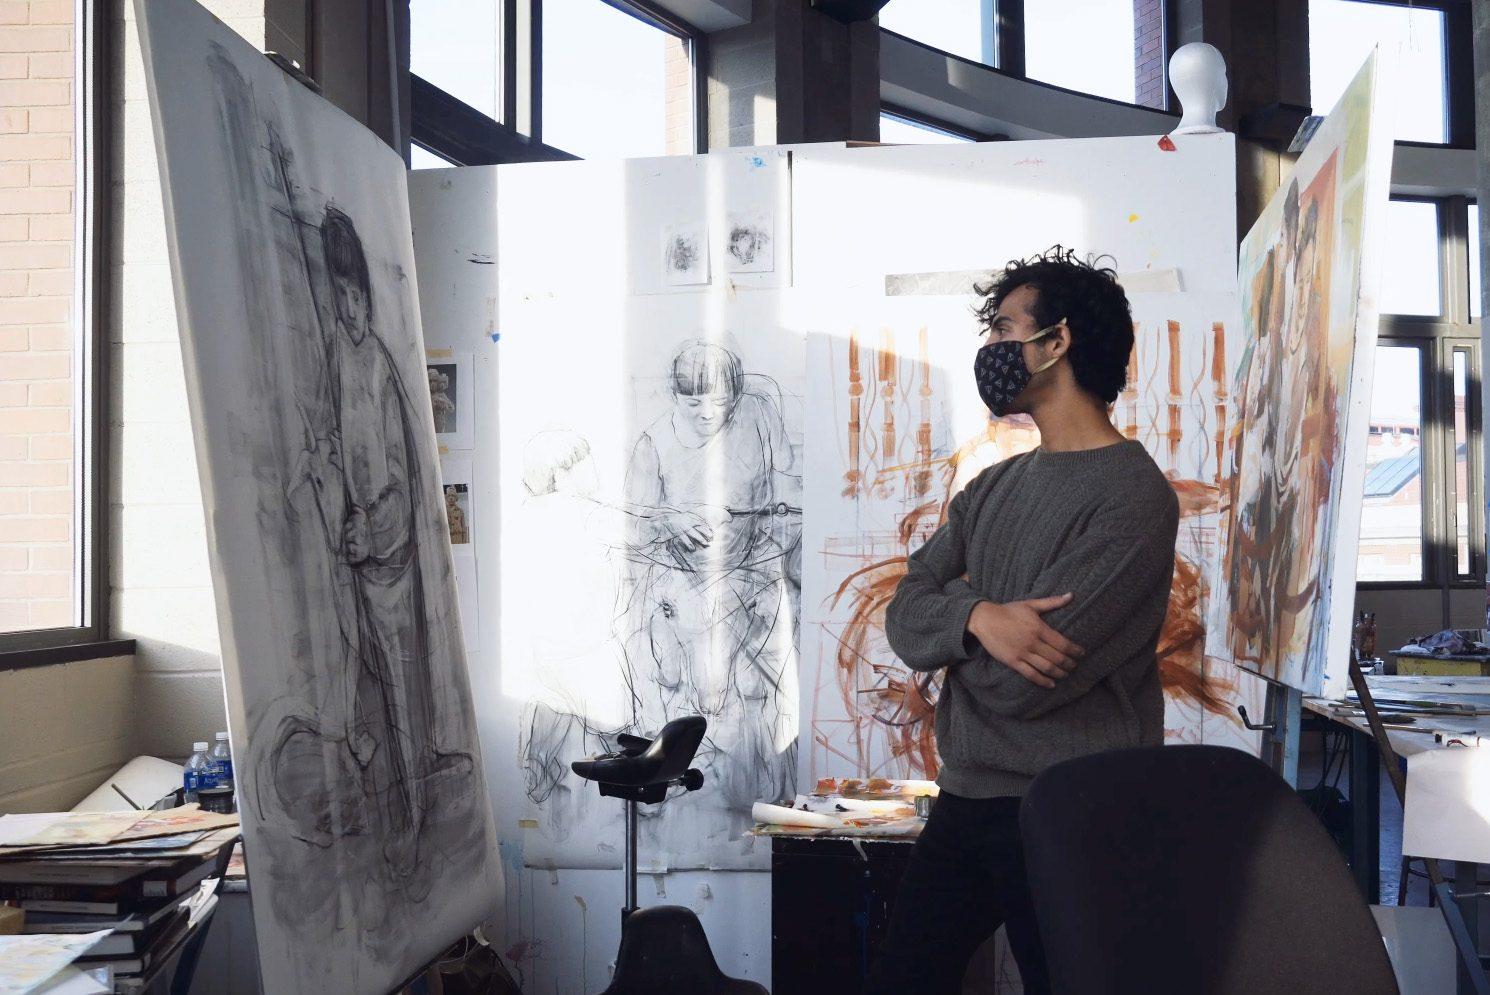 Leito Navarrete is senior at Syracuse University studying studio arts.